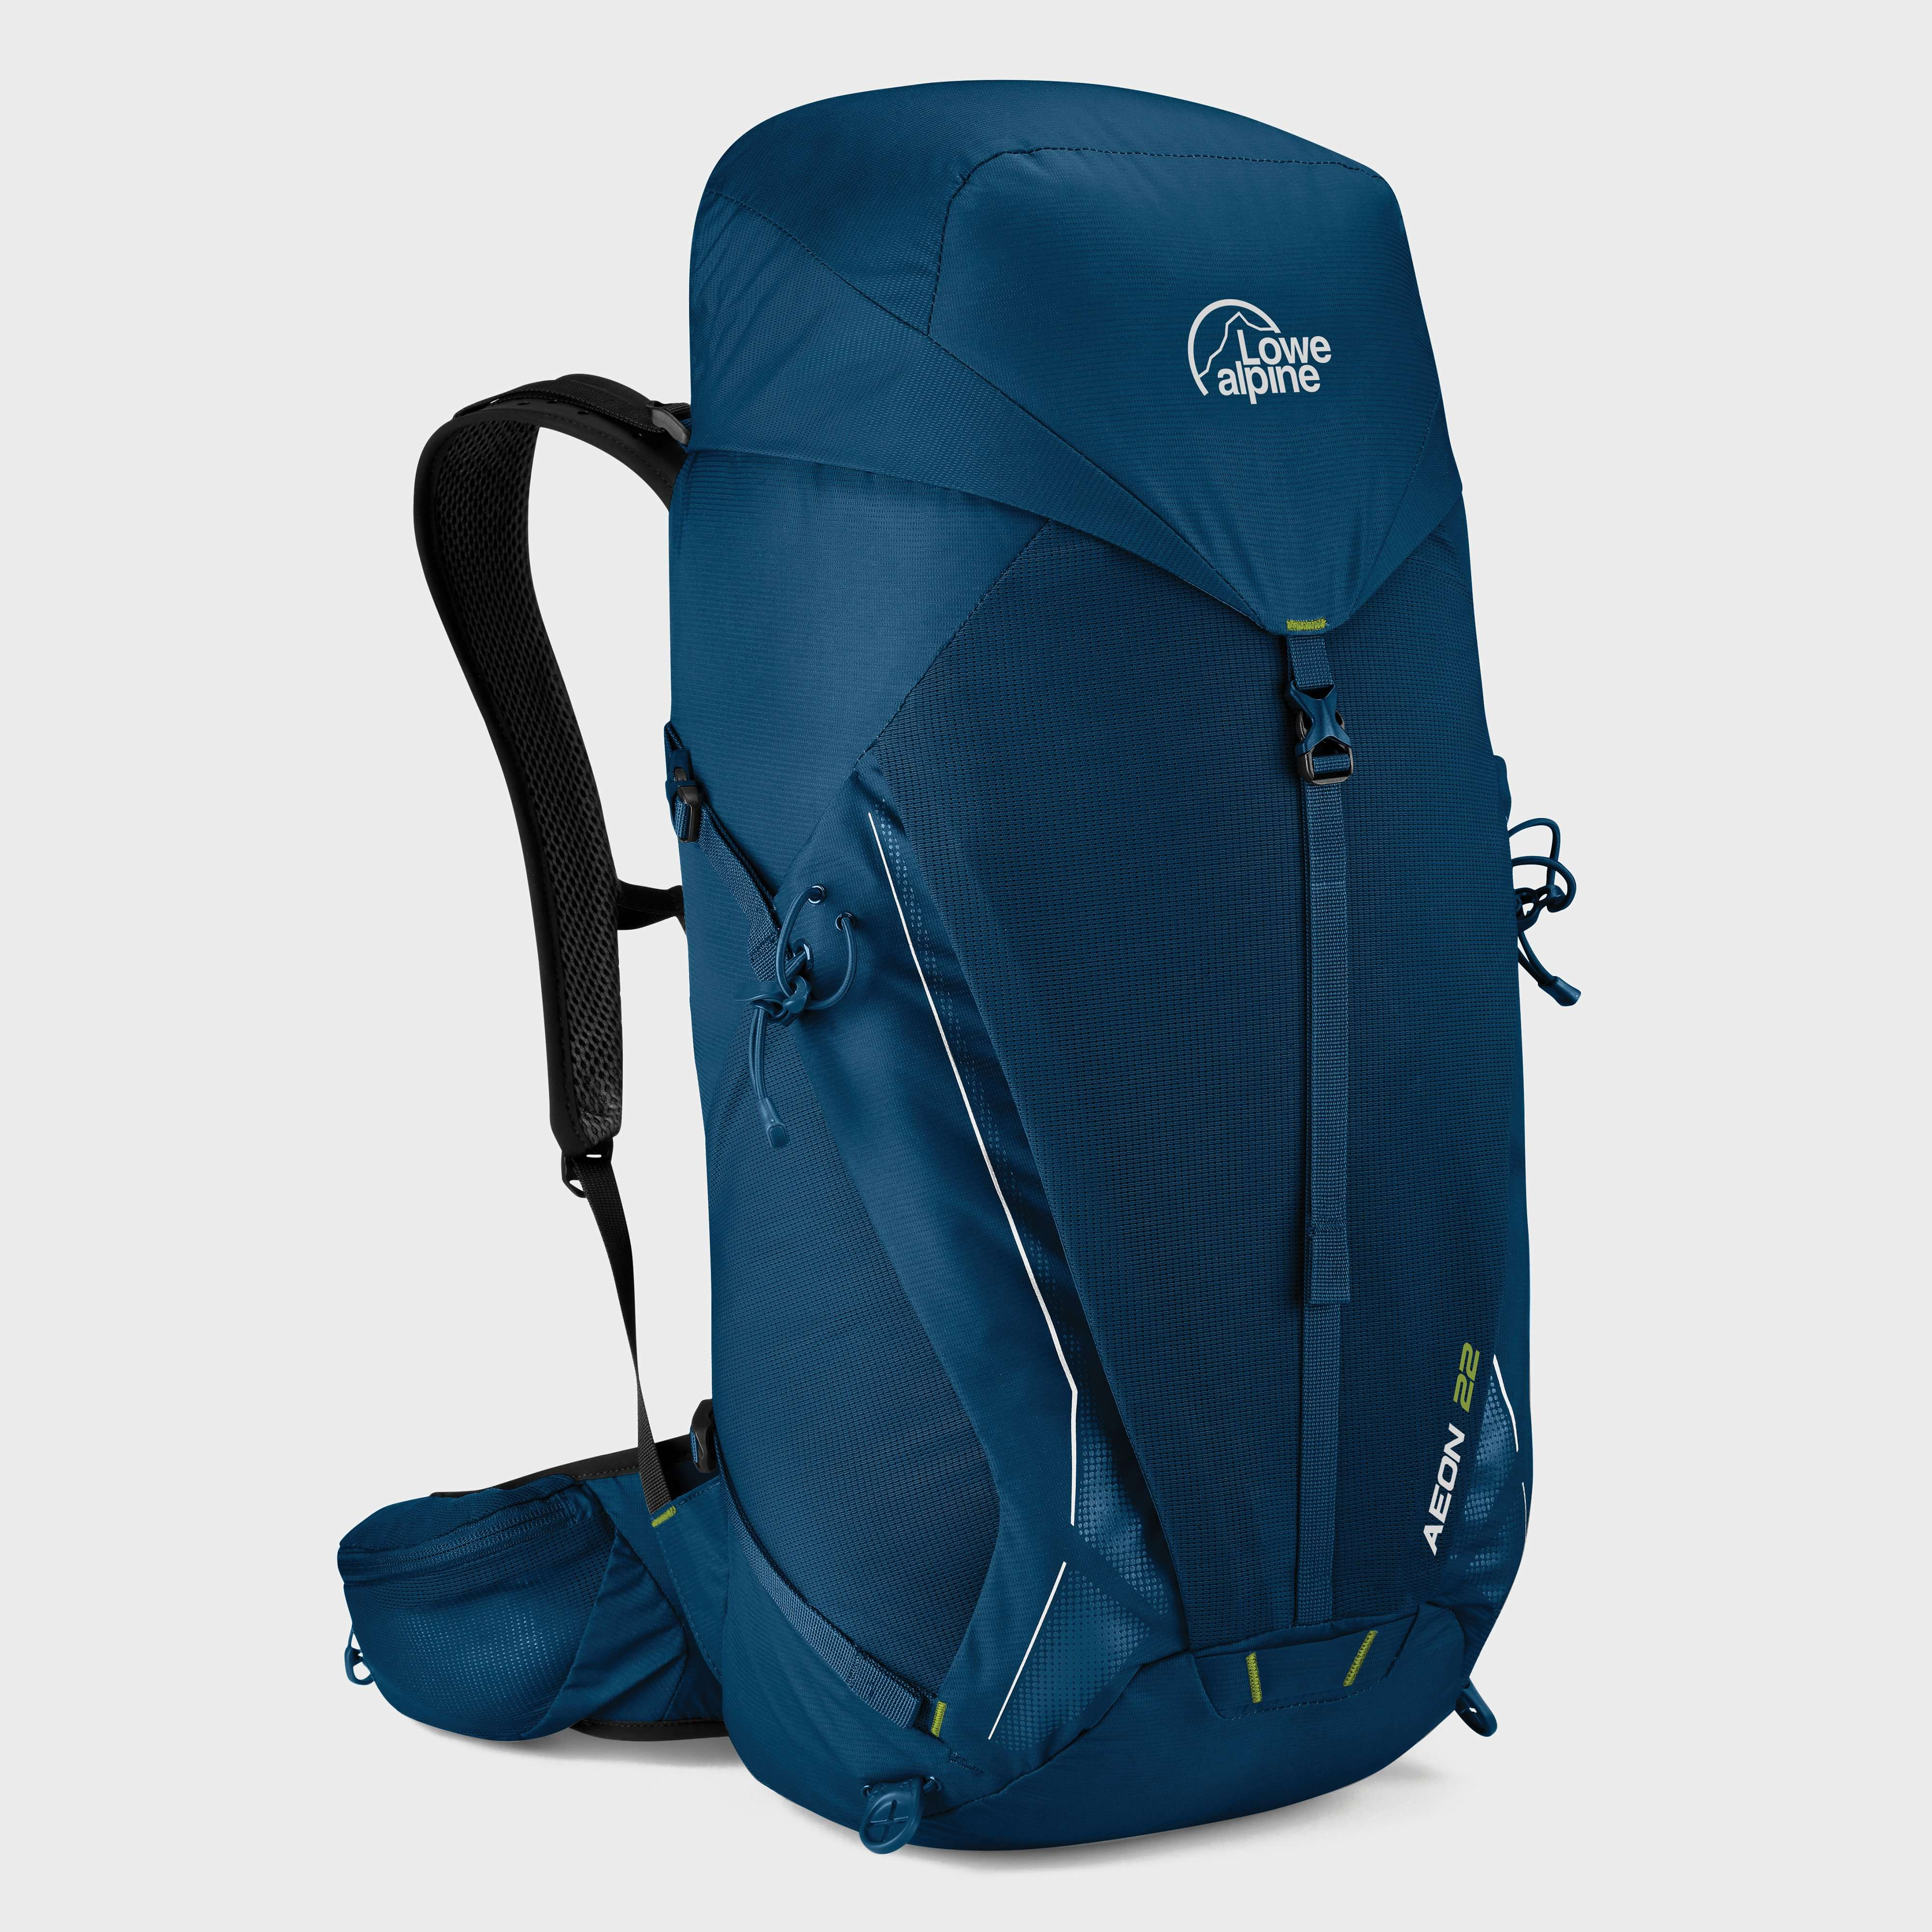 LOWE ALPINE Aeon 22L Daypack